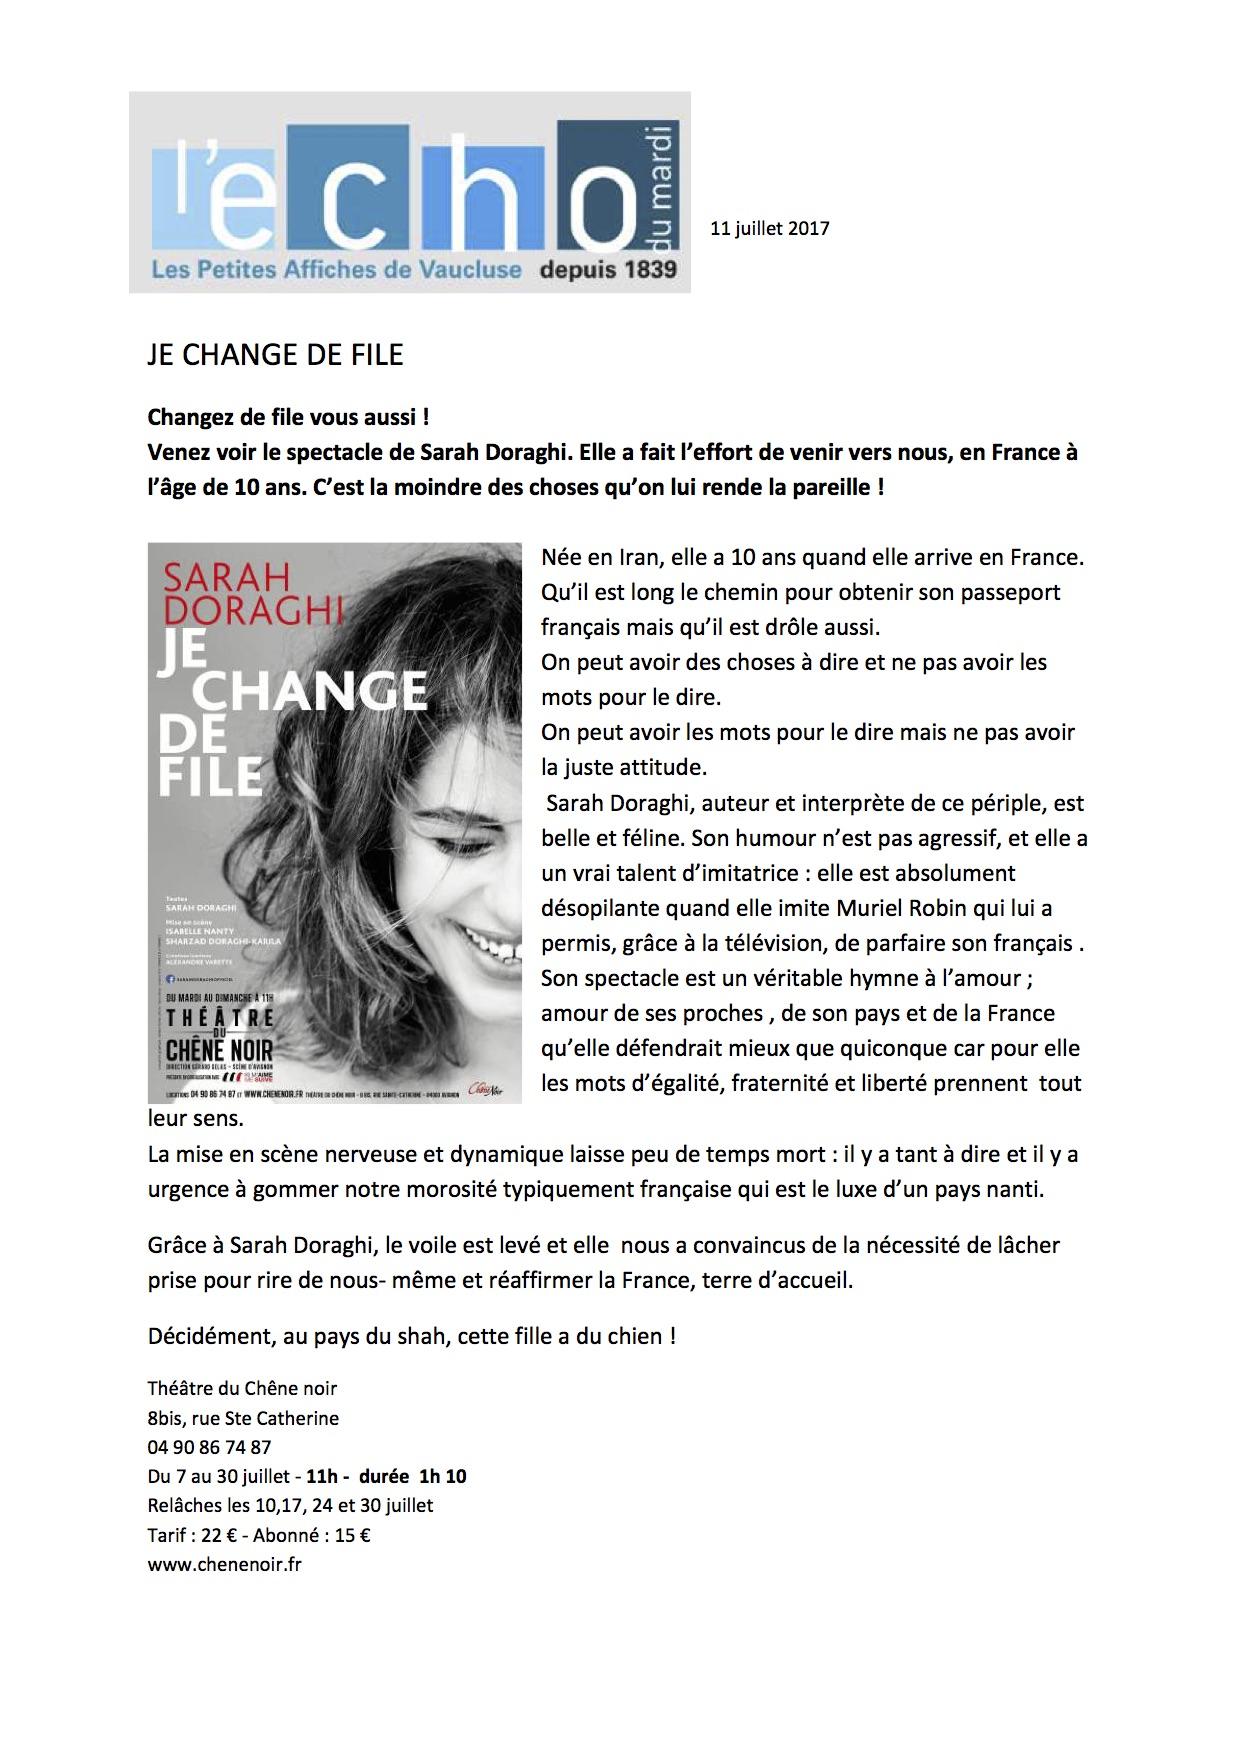 L'Echo Du Mardi 11.07.17